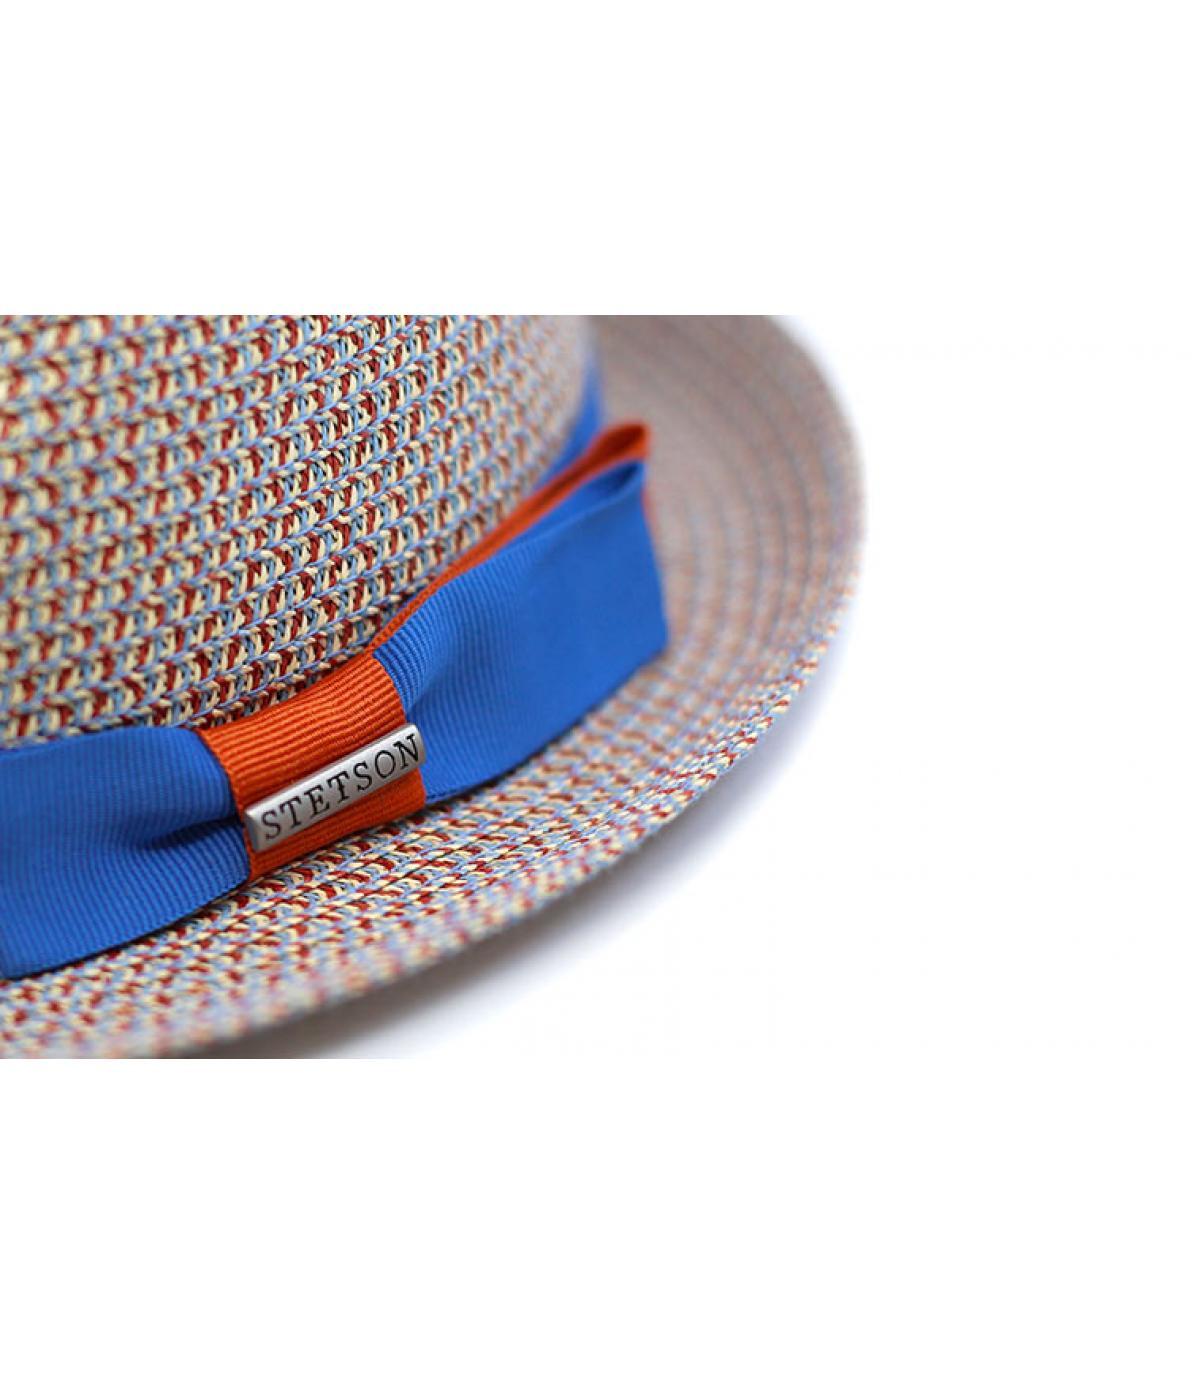 Dettagli Trilby Toyo blue beige - image 3